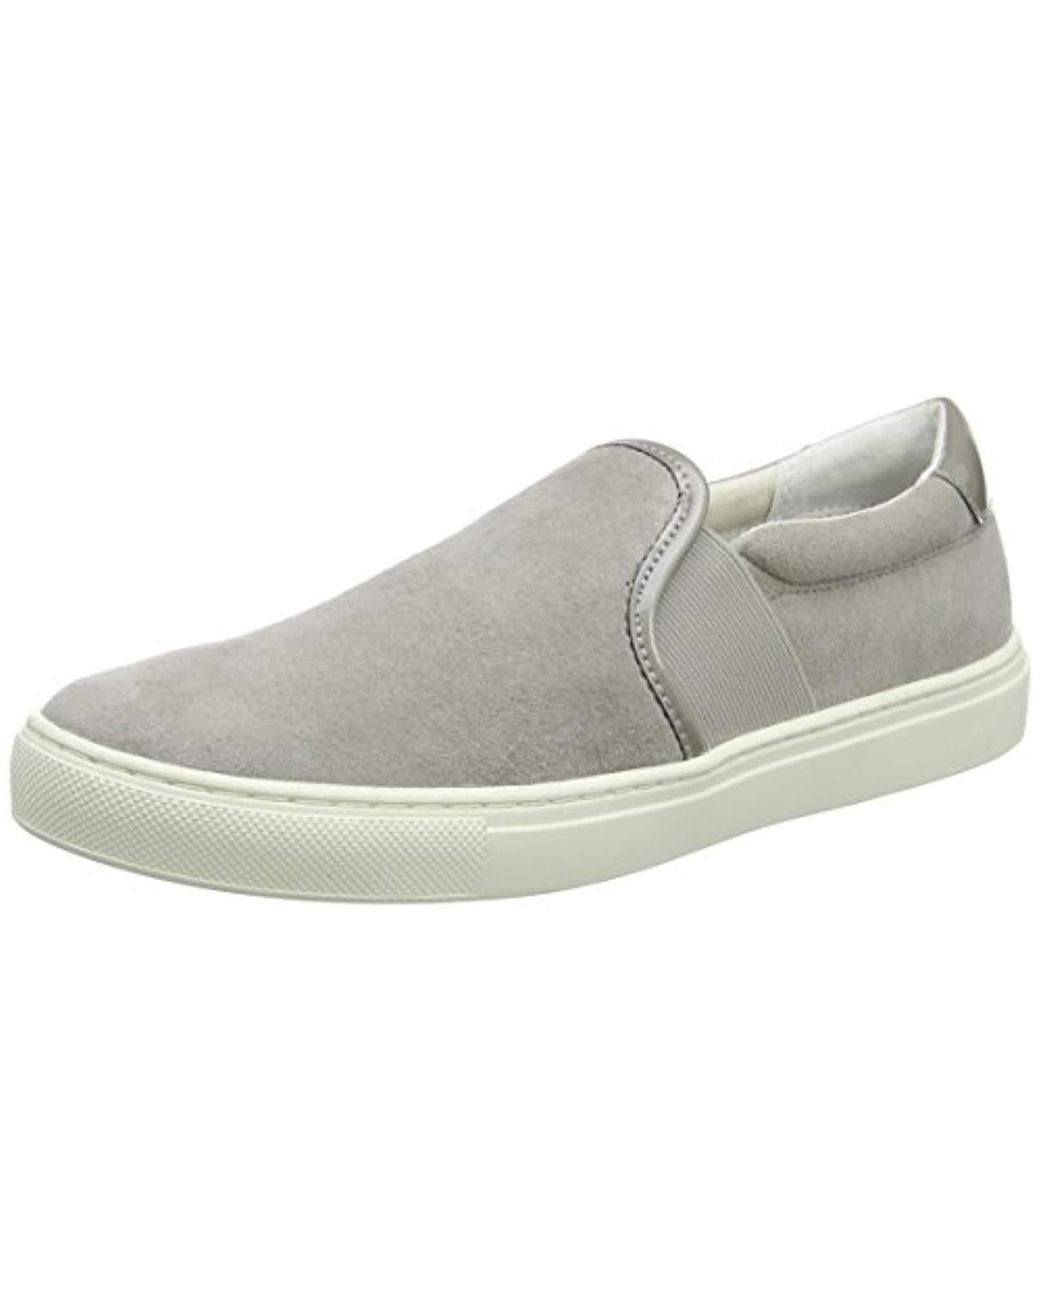 69cfaa7f77 Geox D Trysure B Low-top Sneakers in Gray - Lyst